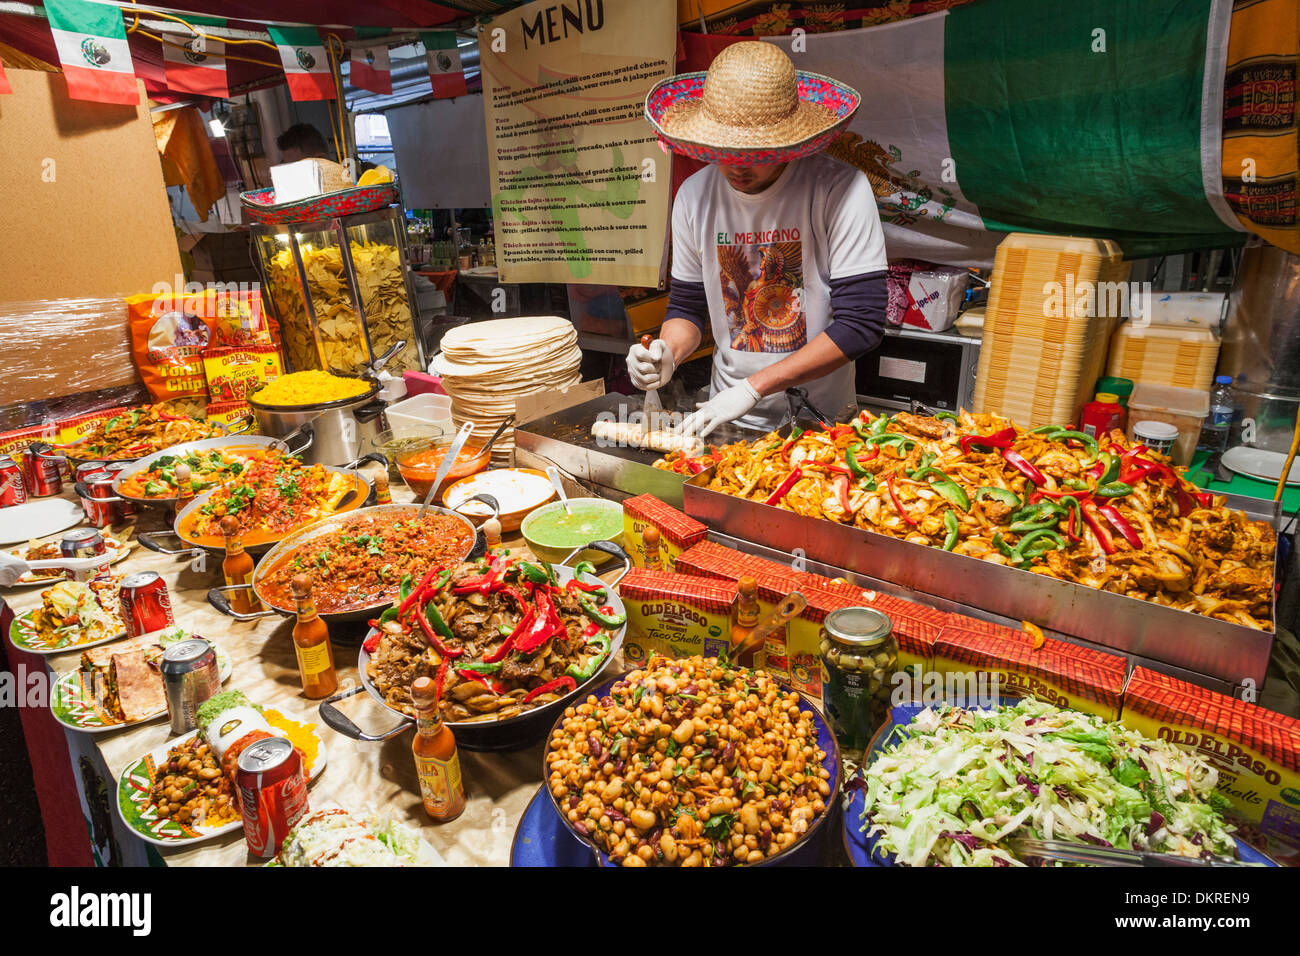 England, London, Shoreditch, Brick Lane, Man Selling Mexican Food - Stock Image